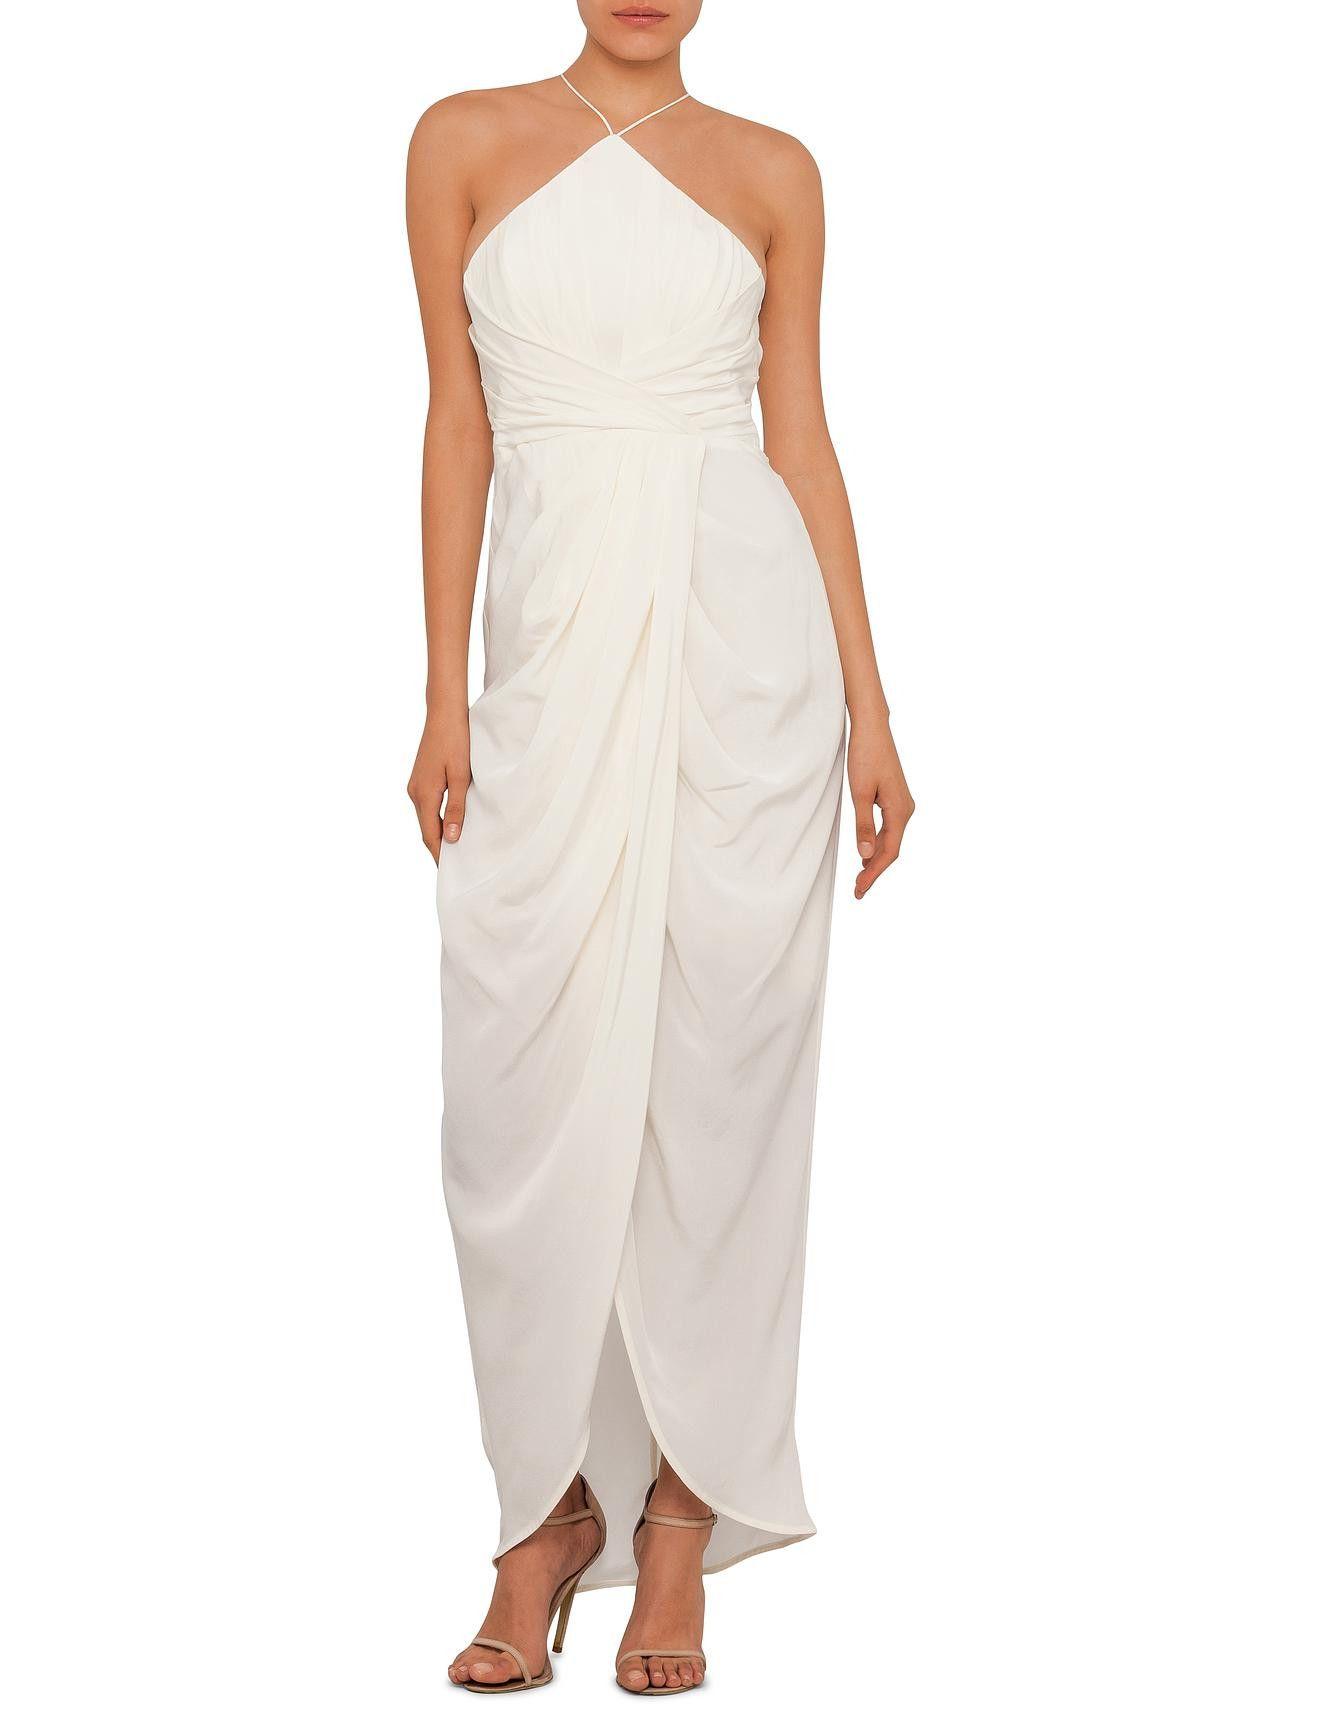 White dress david jones - Silk Tuck Long Dress David Jones